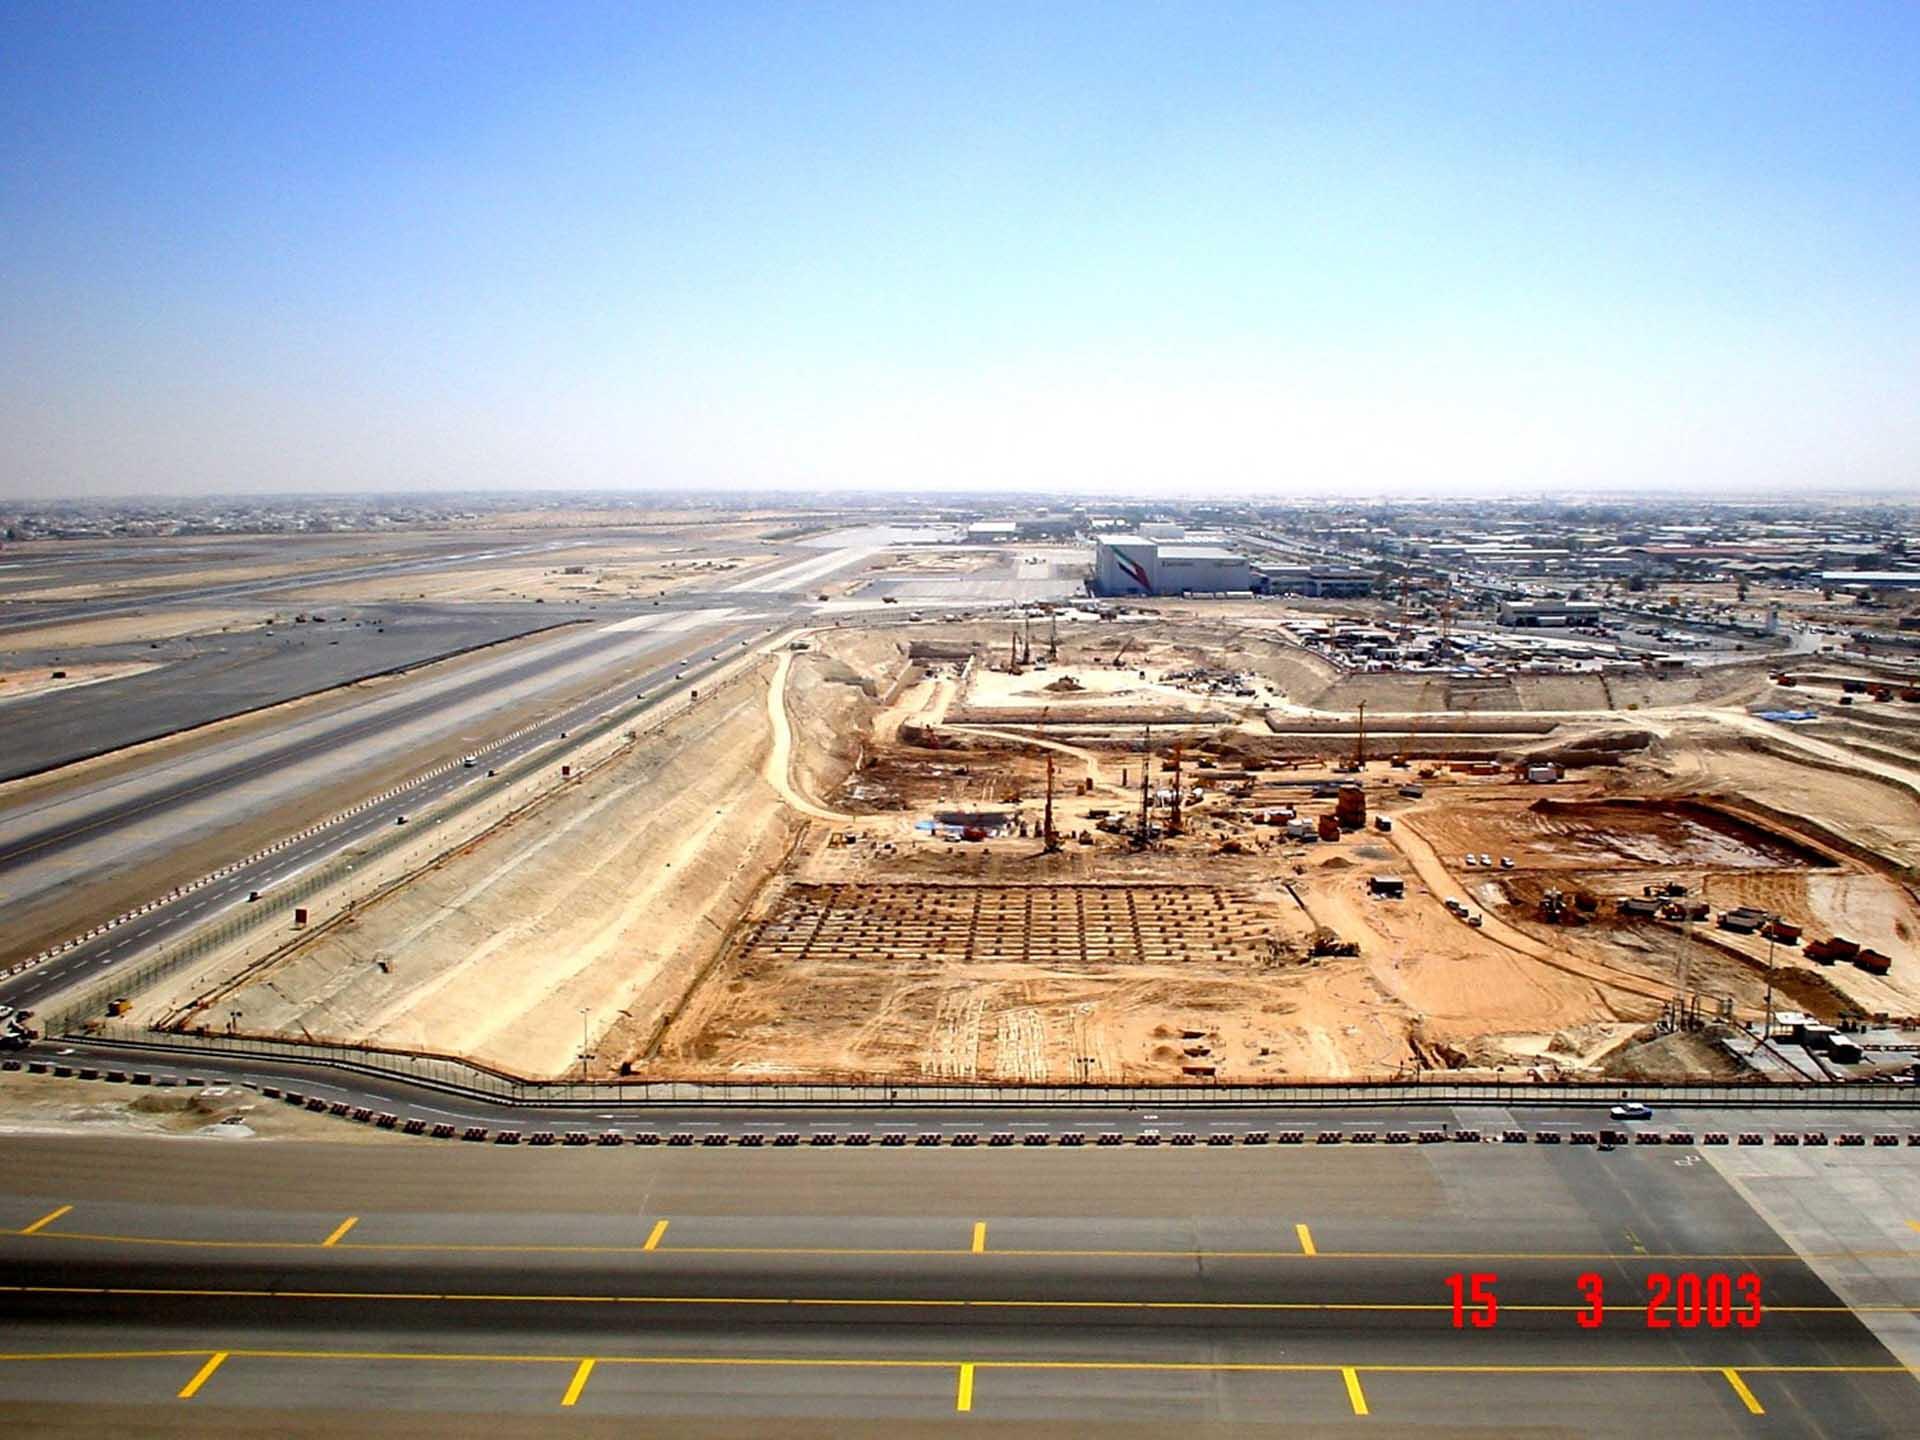 Dubai Airport WJ Groundwater